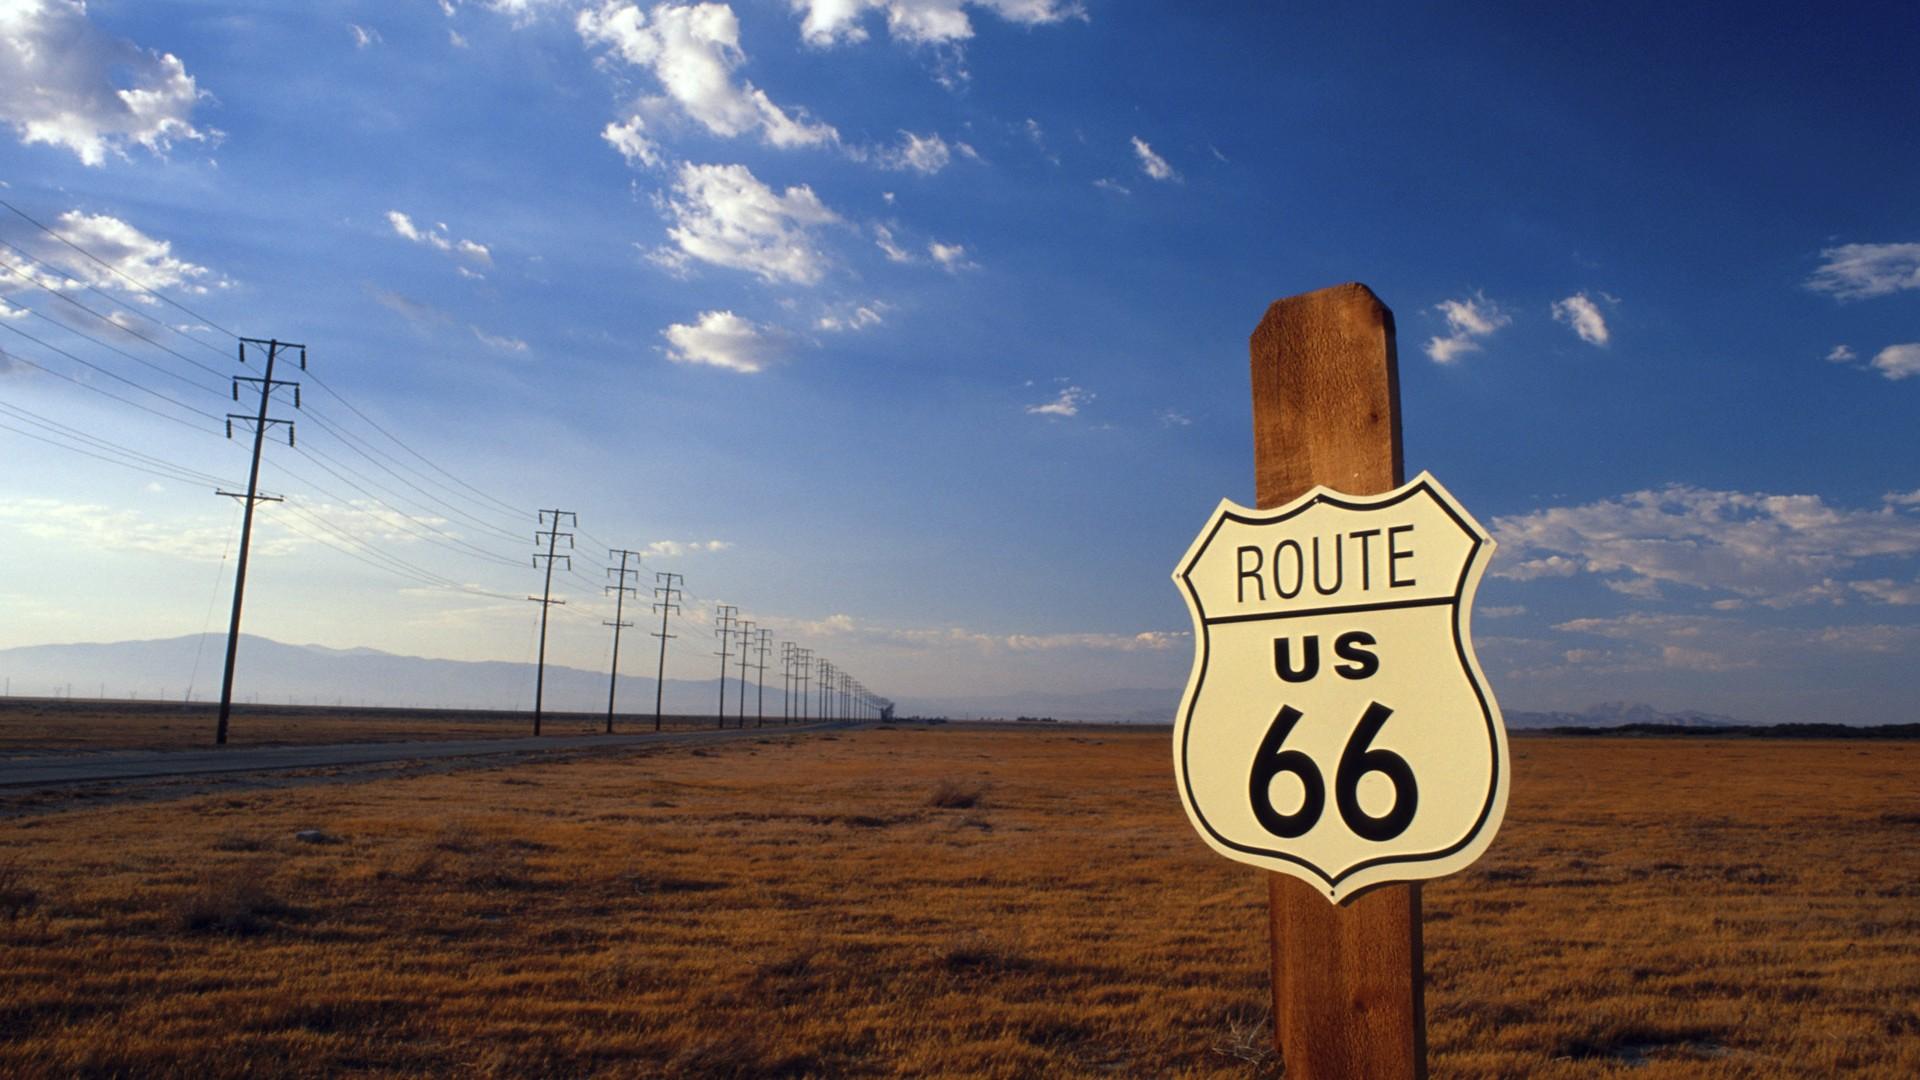 route 66 wallpaper hd - photo #23